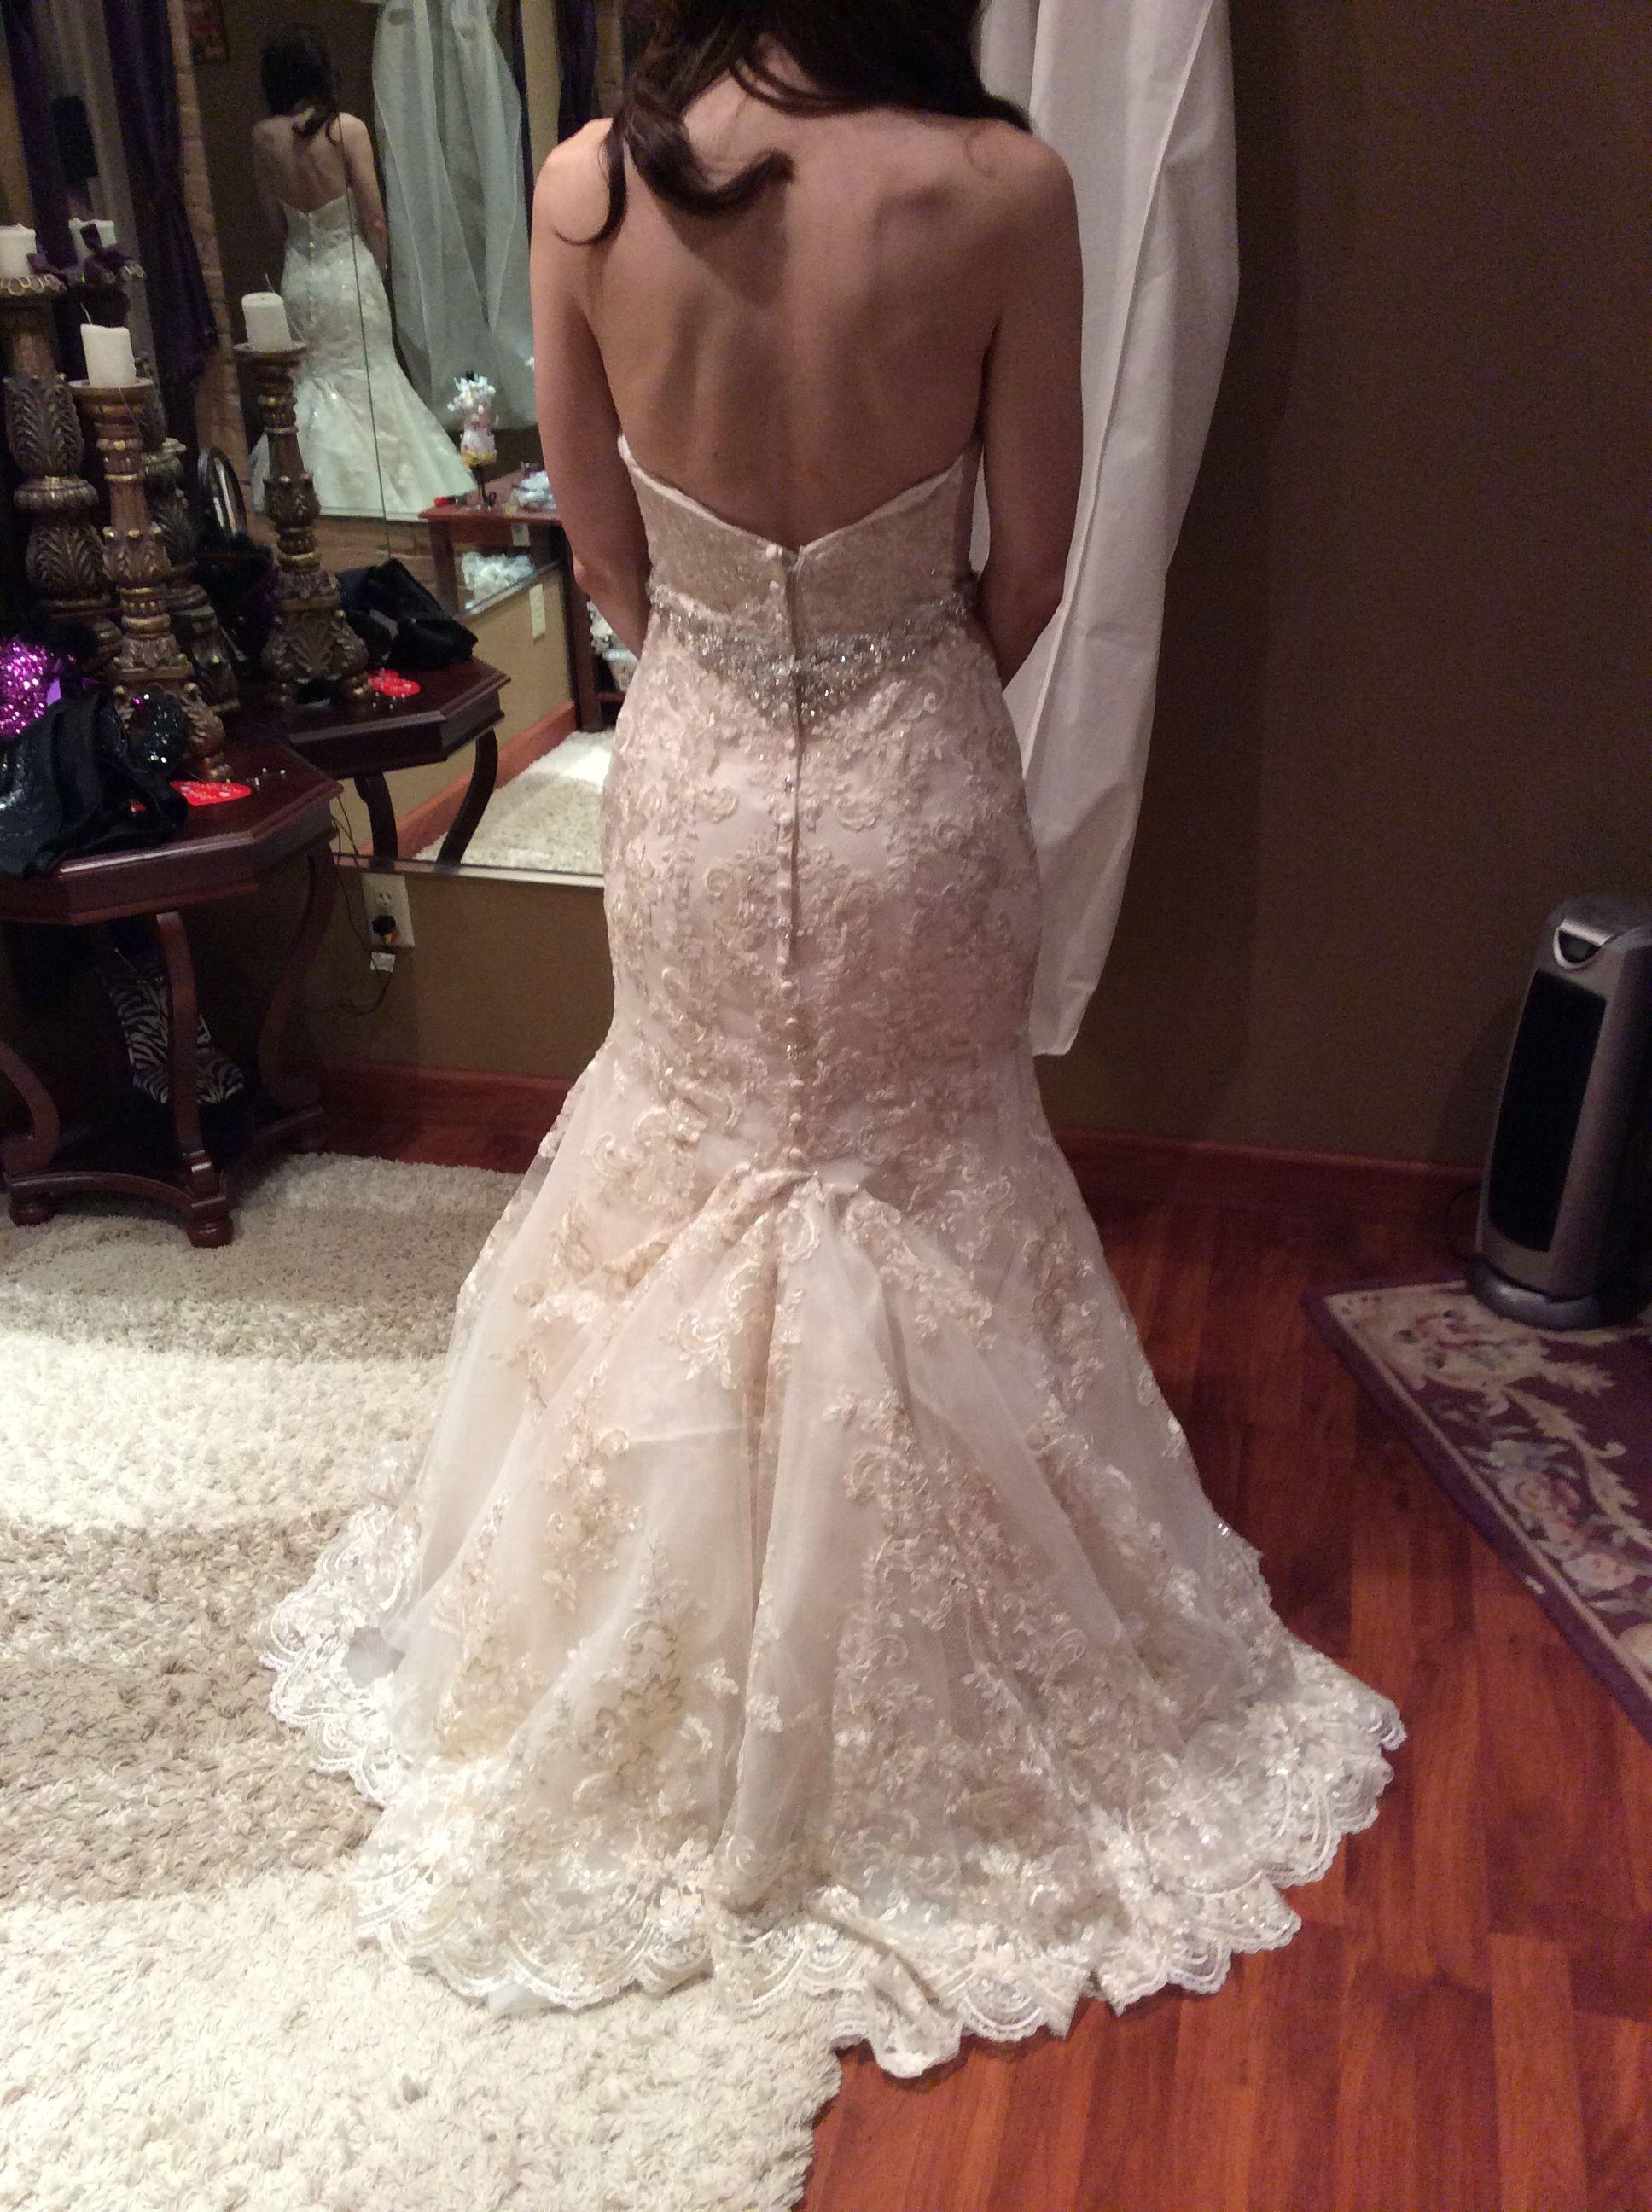 The bustle wedding dresses  Over bustle  Wedding  Pinterest